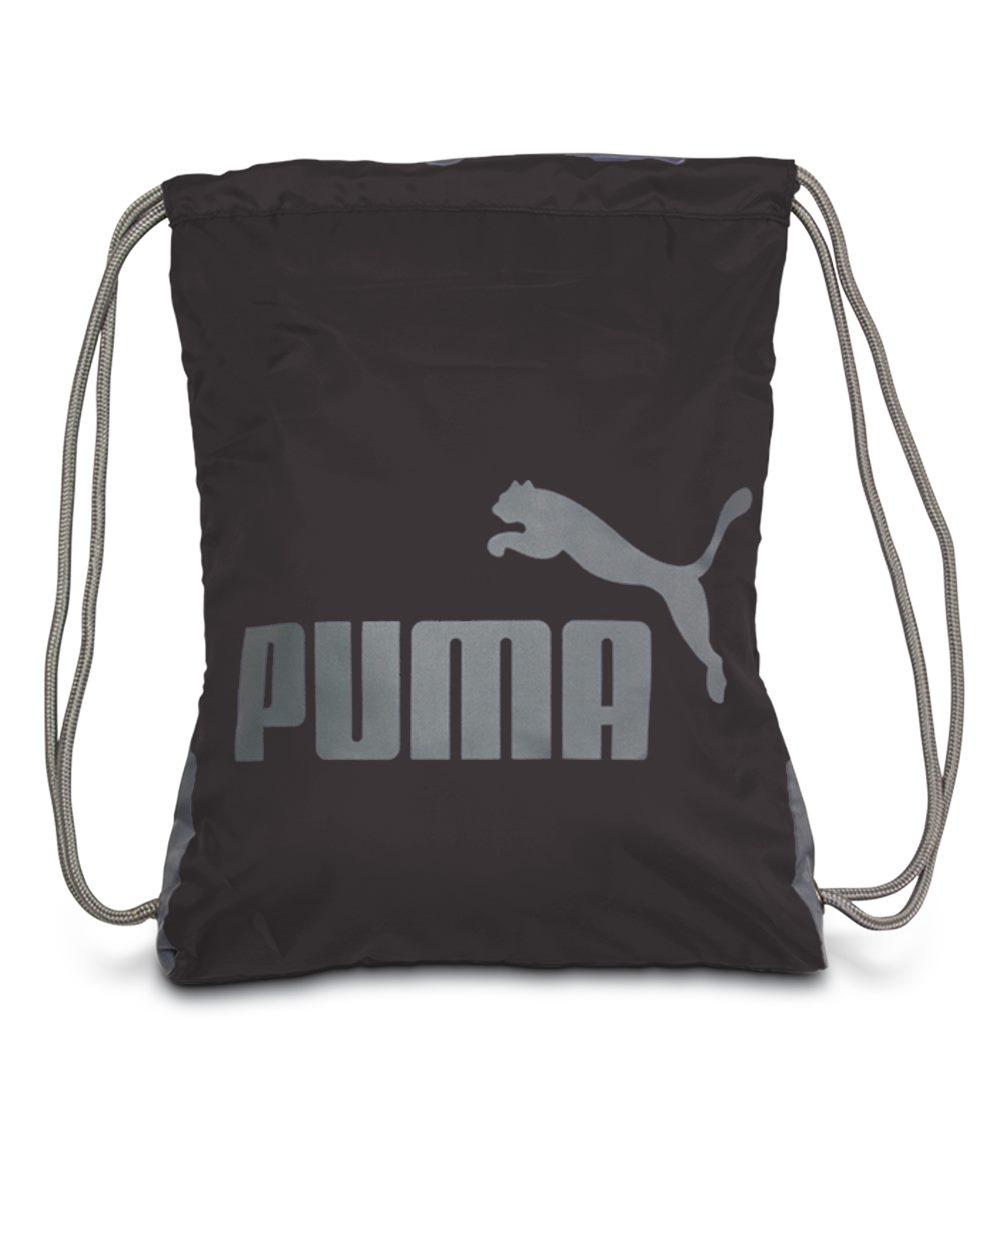 PUMA PSC1006 - Forever Carrysack